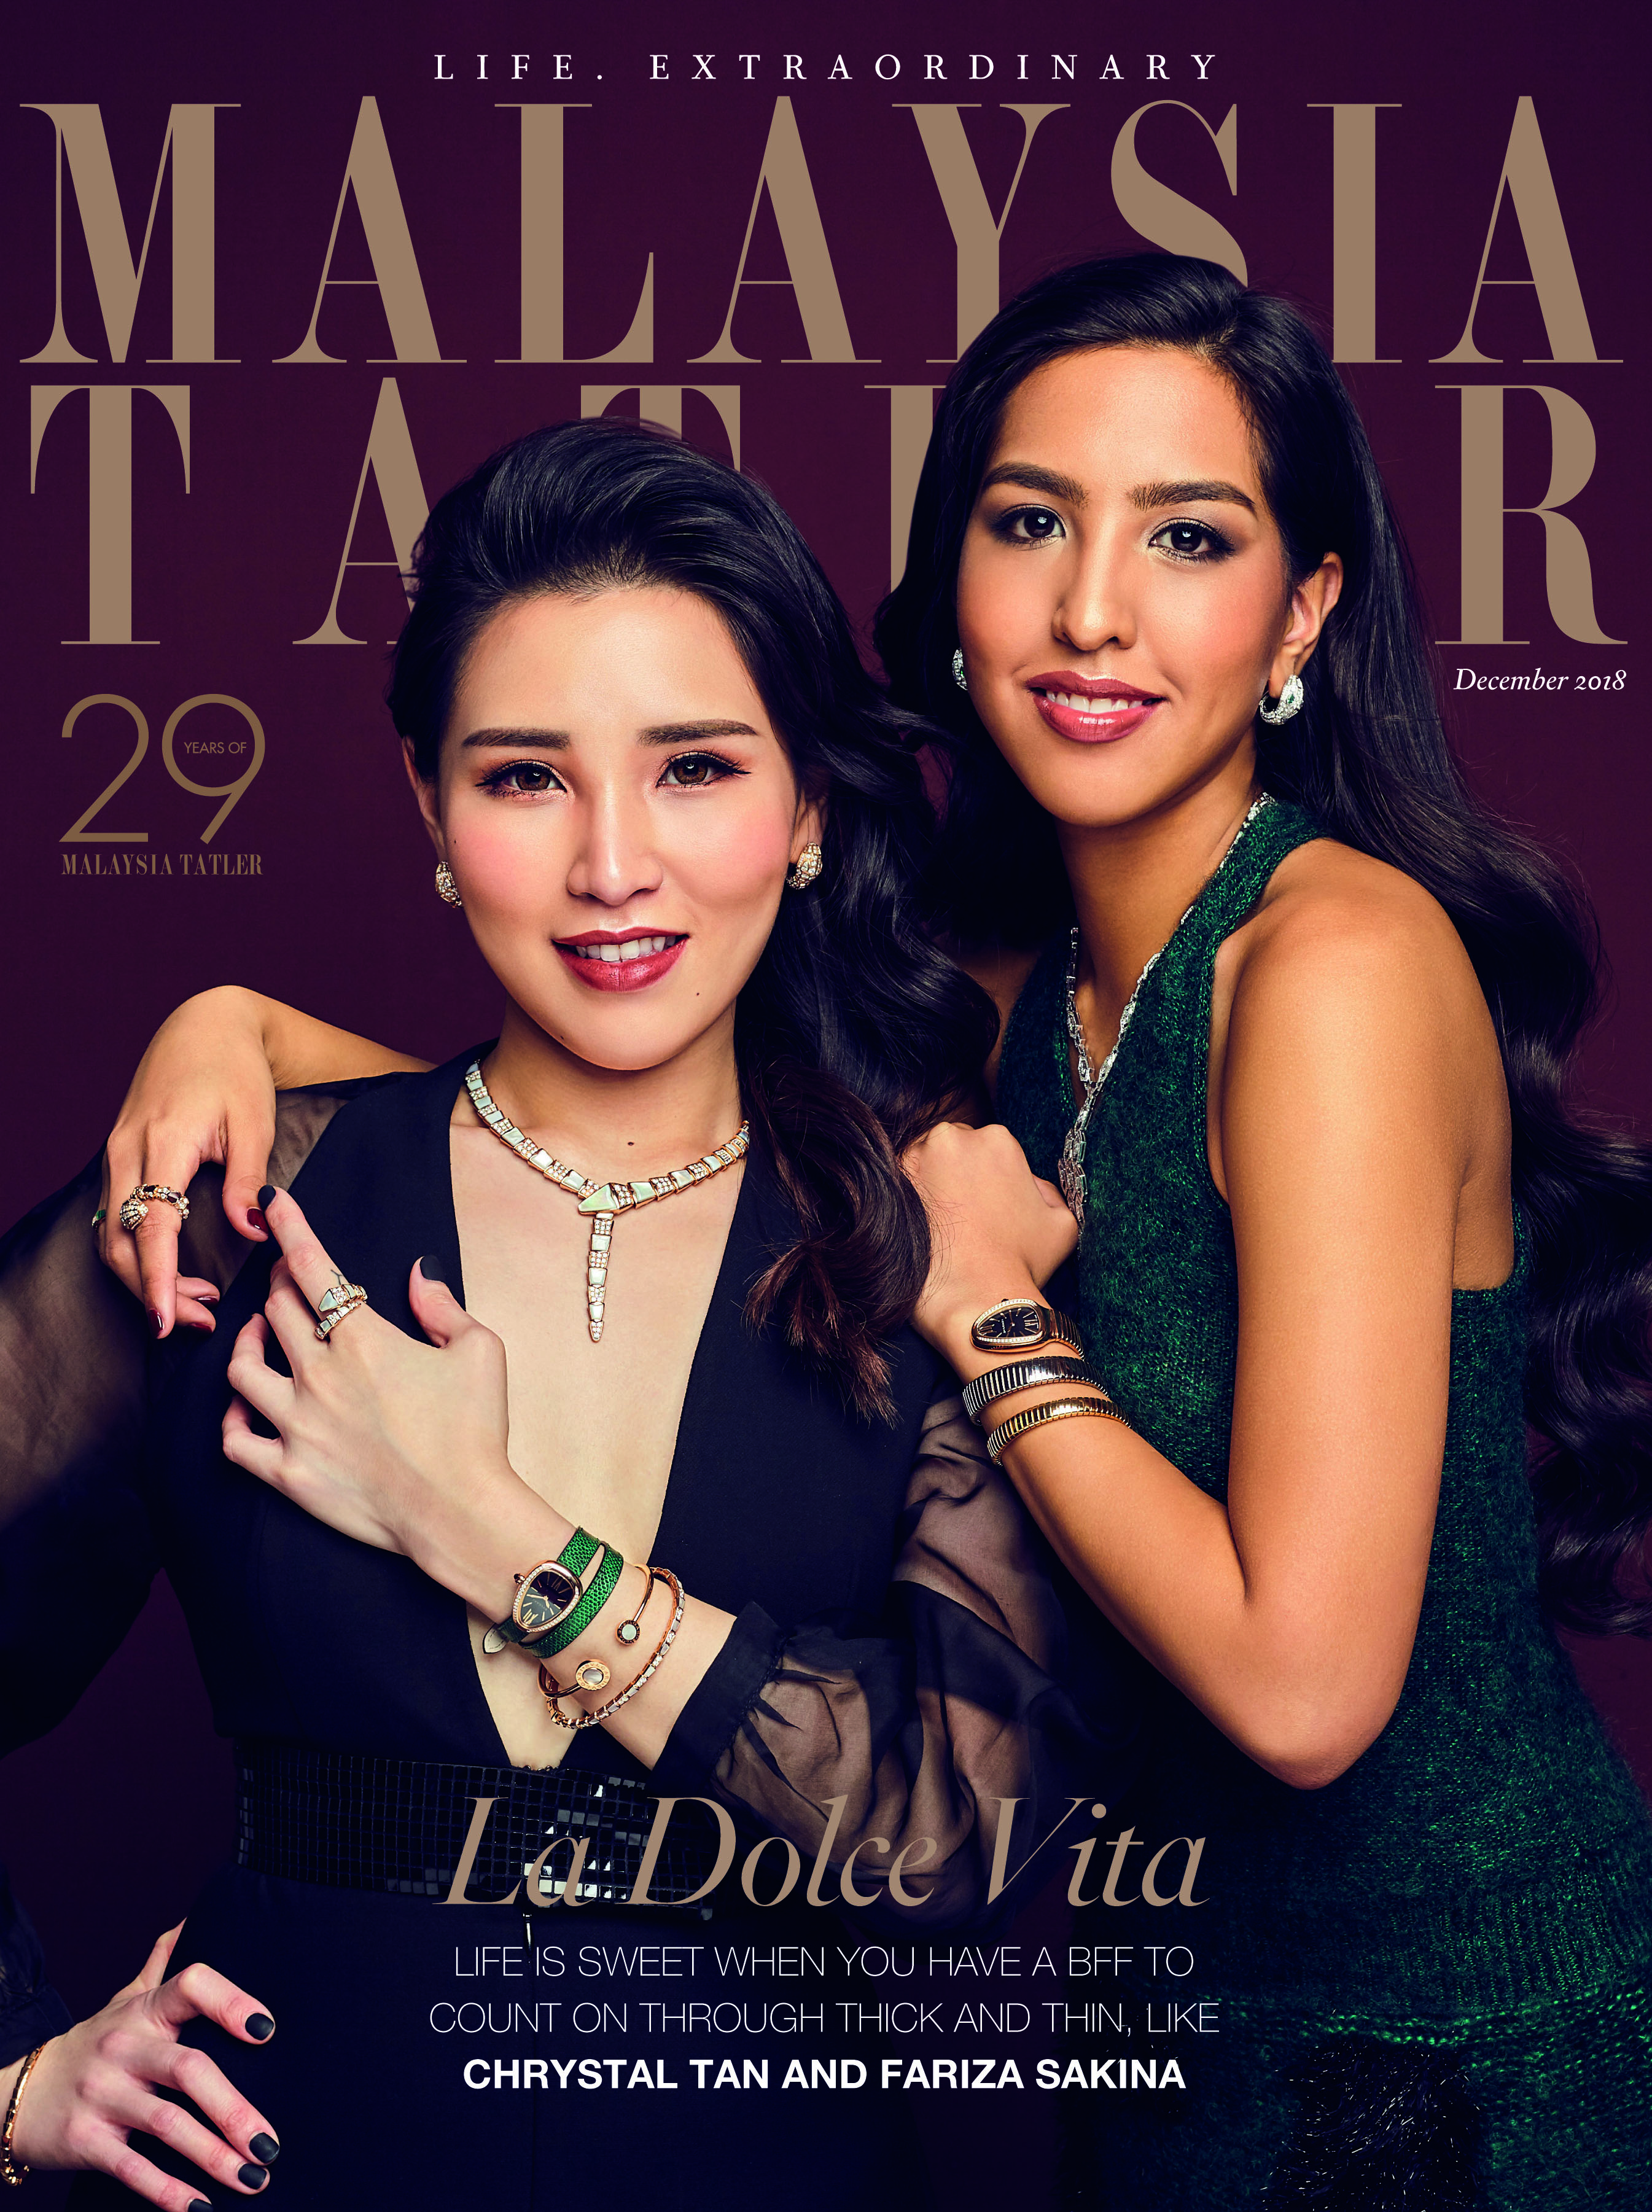 Chrystal Tan and Fariza Sakina